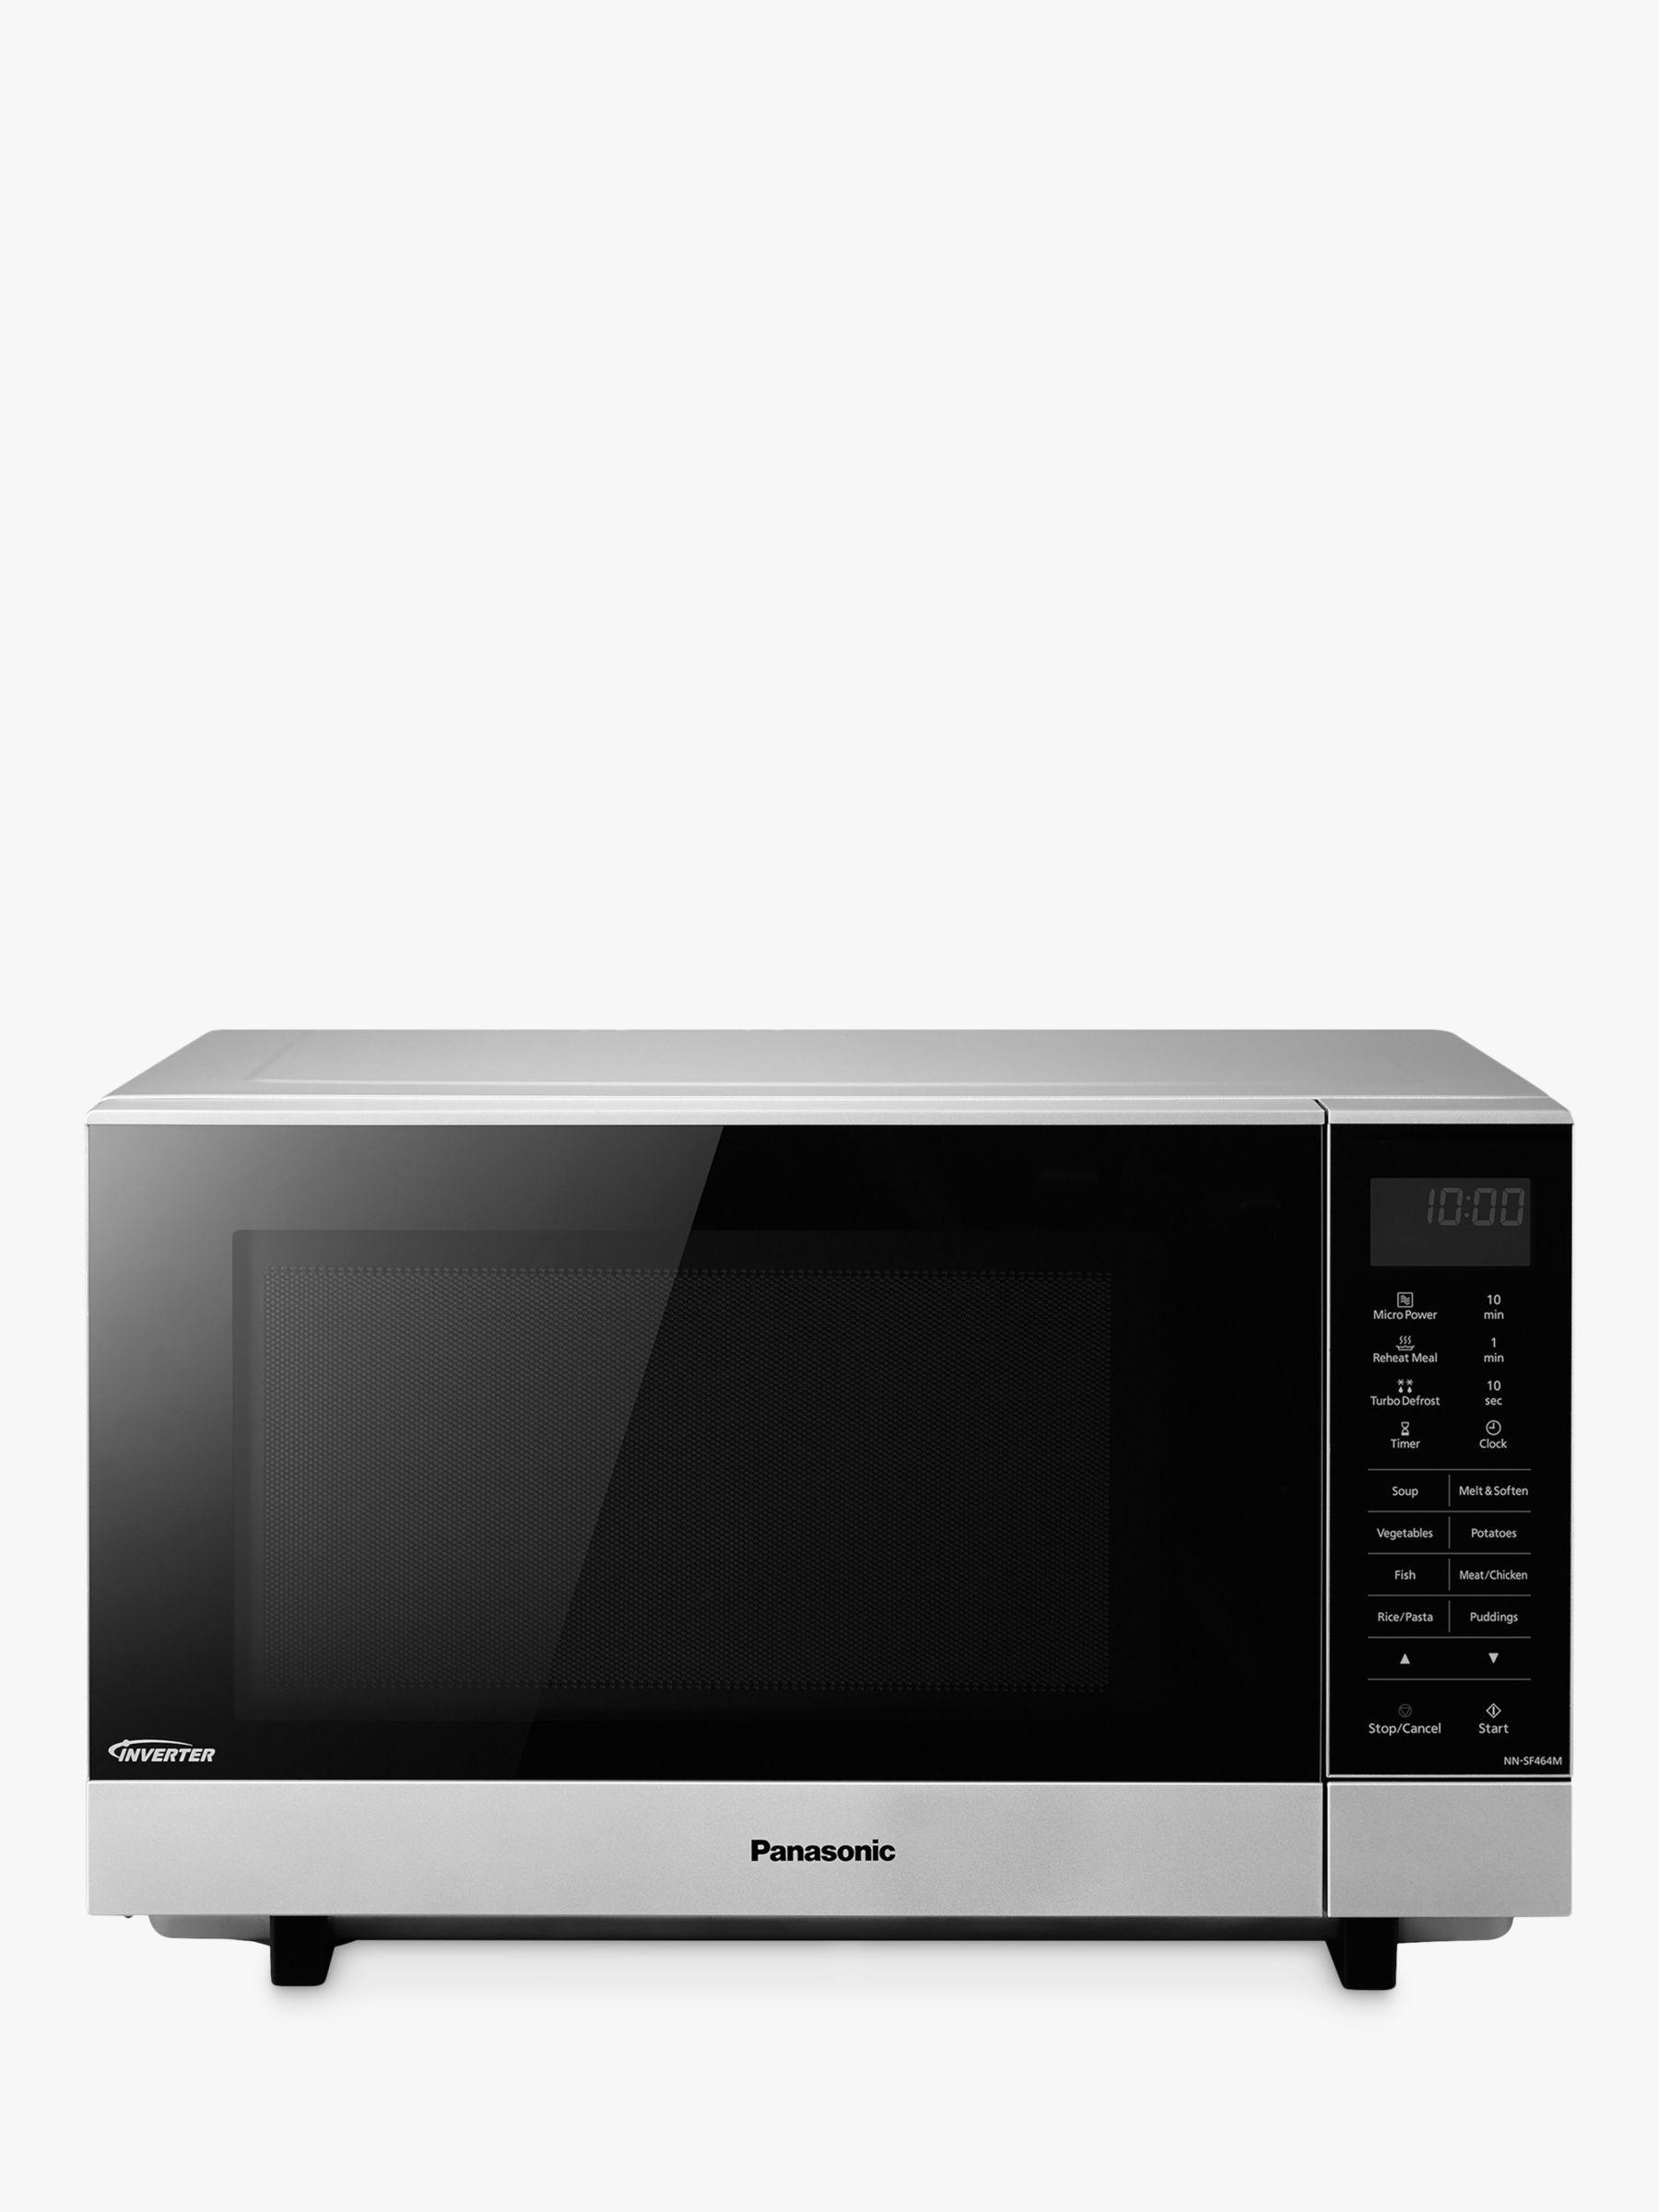 Panasonic Panasonic NN-SF464MBPQ Microwave, Silver